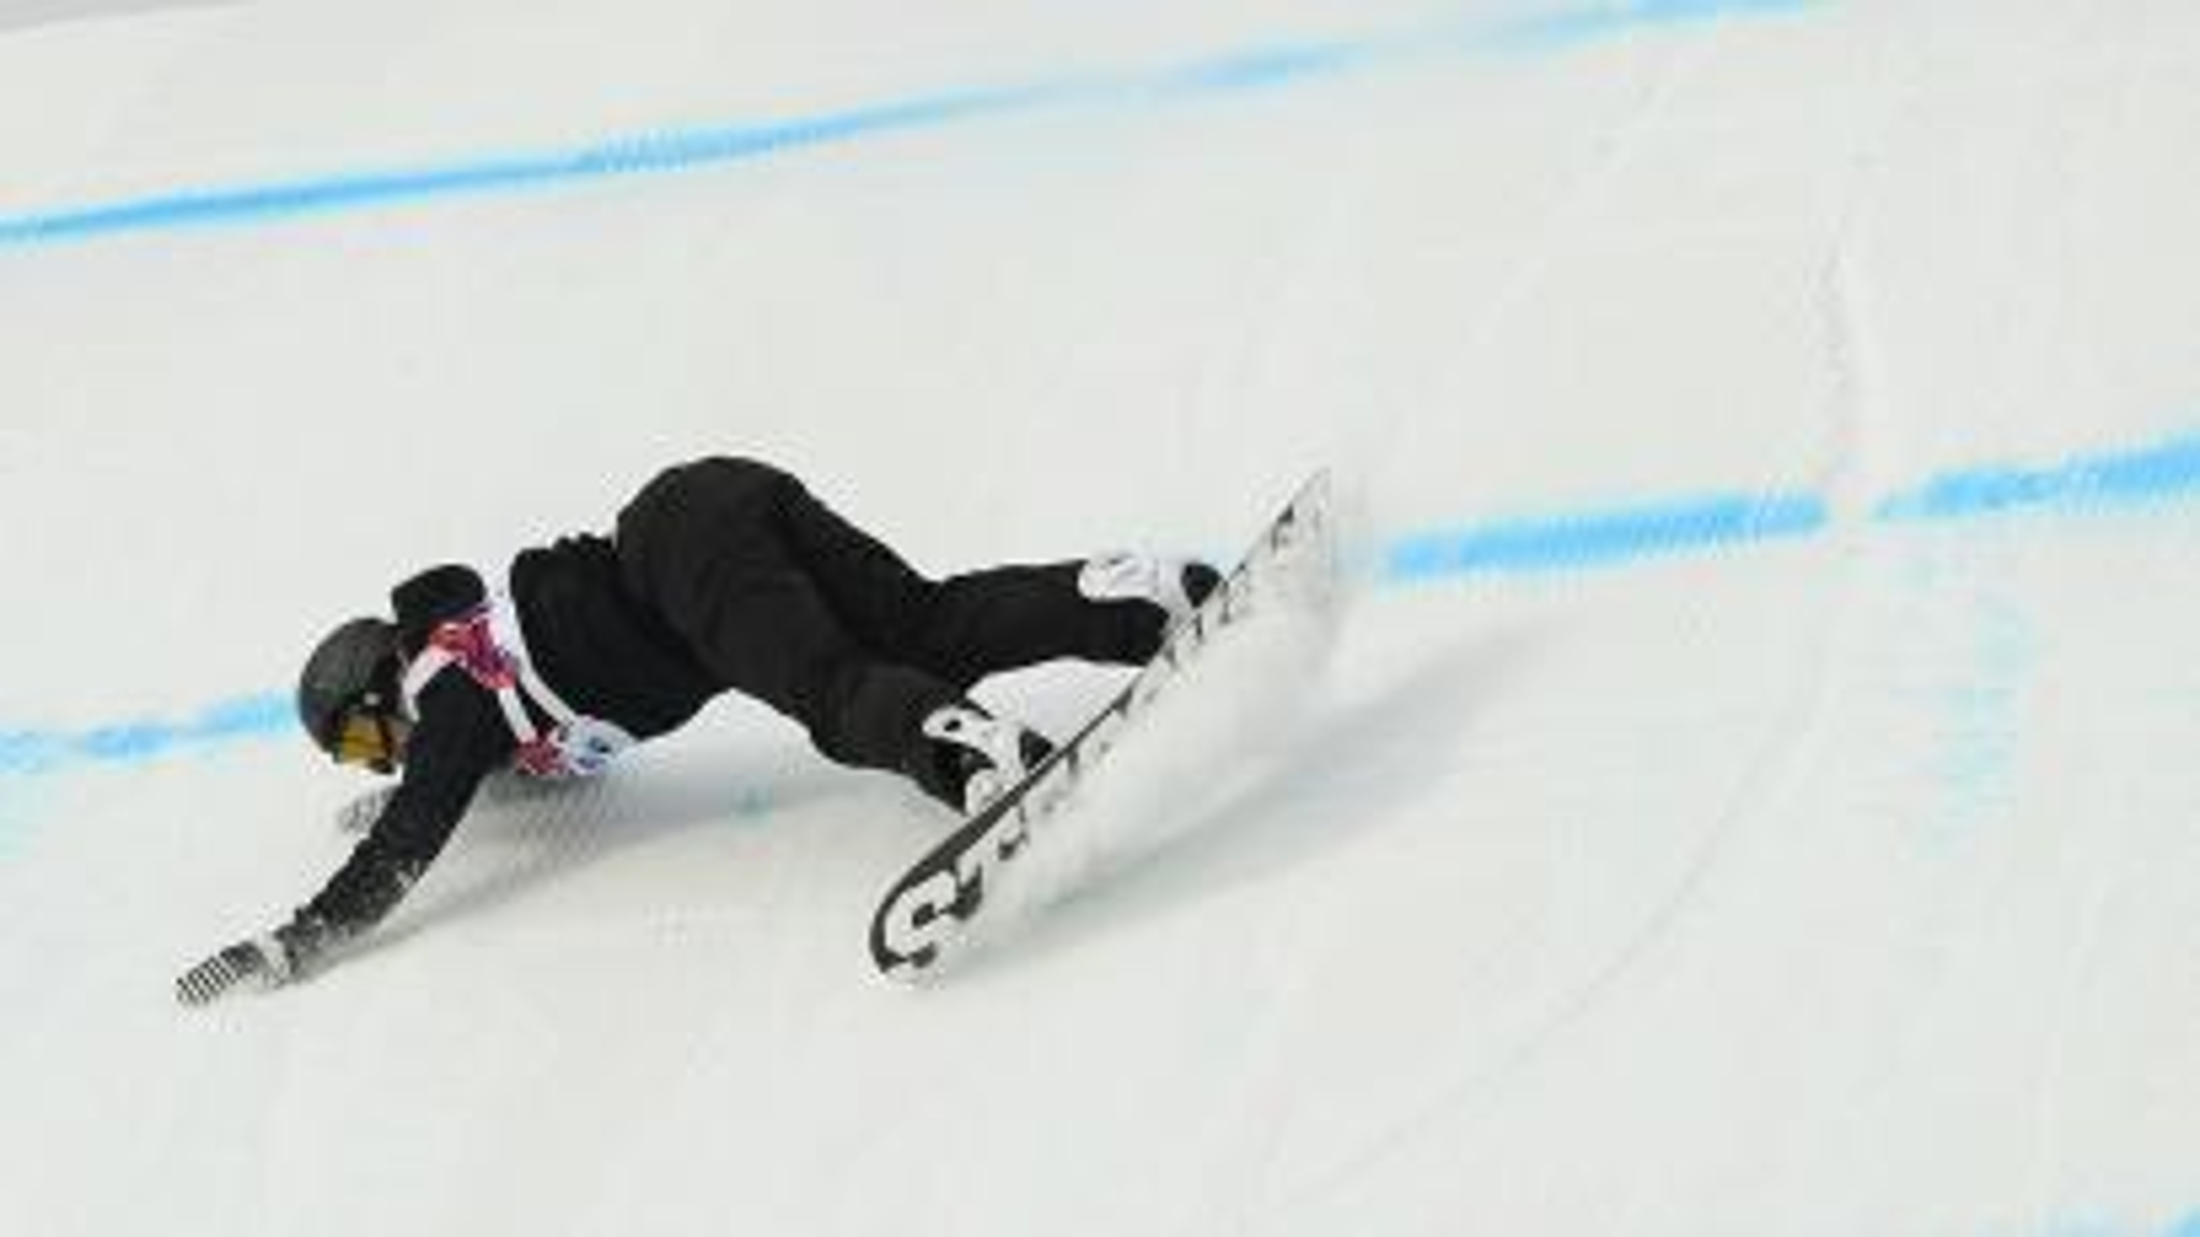 snowboarding-and-snow-sports-see-slight-decline — Quartz